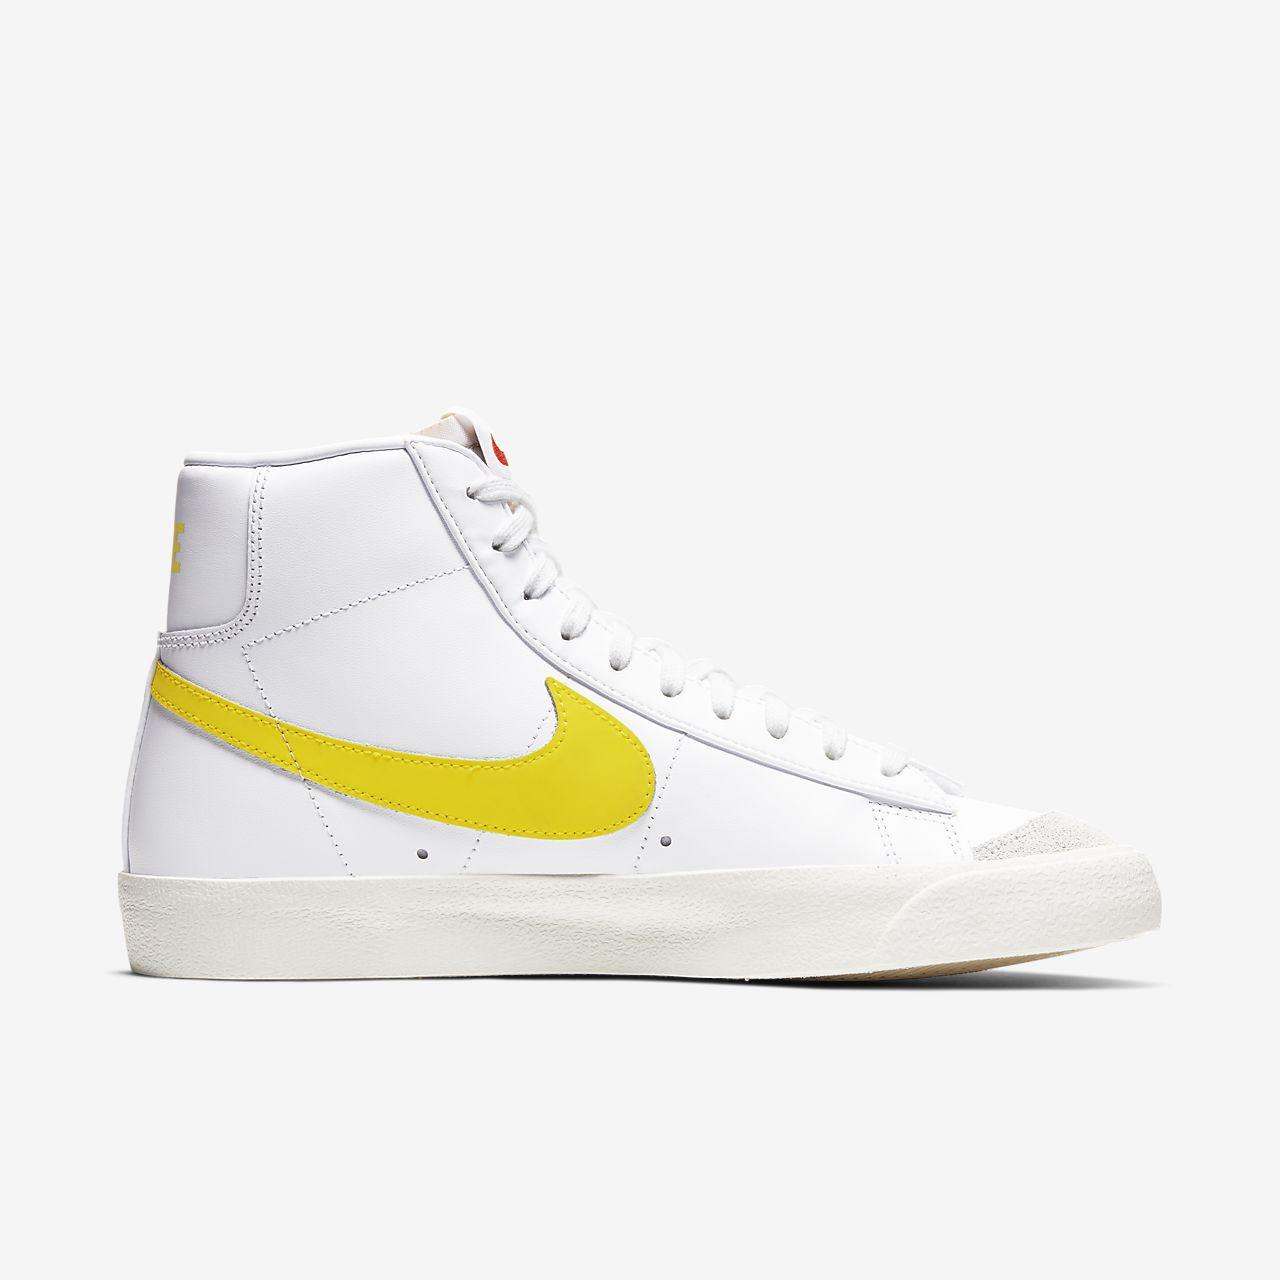 6d96c00a Nike Blazer Mid '77 Vintage Men's Shoe. Nike.com